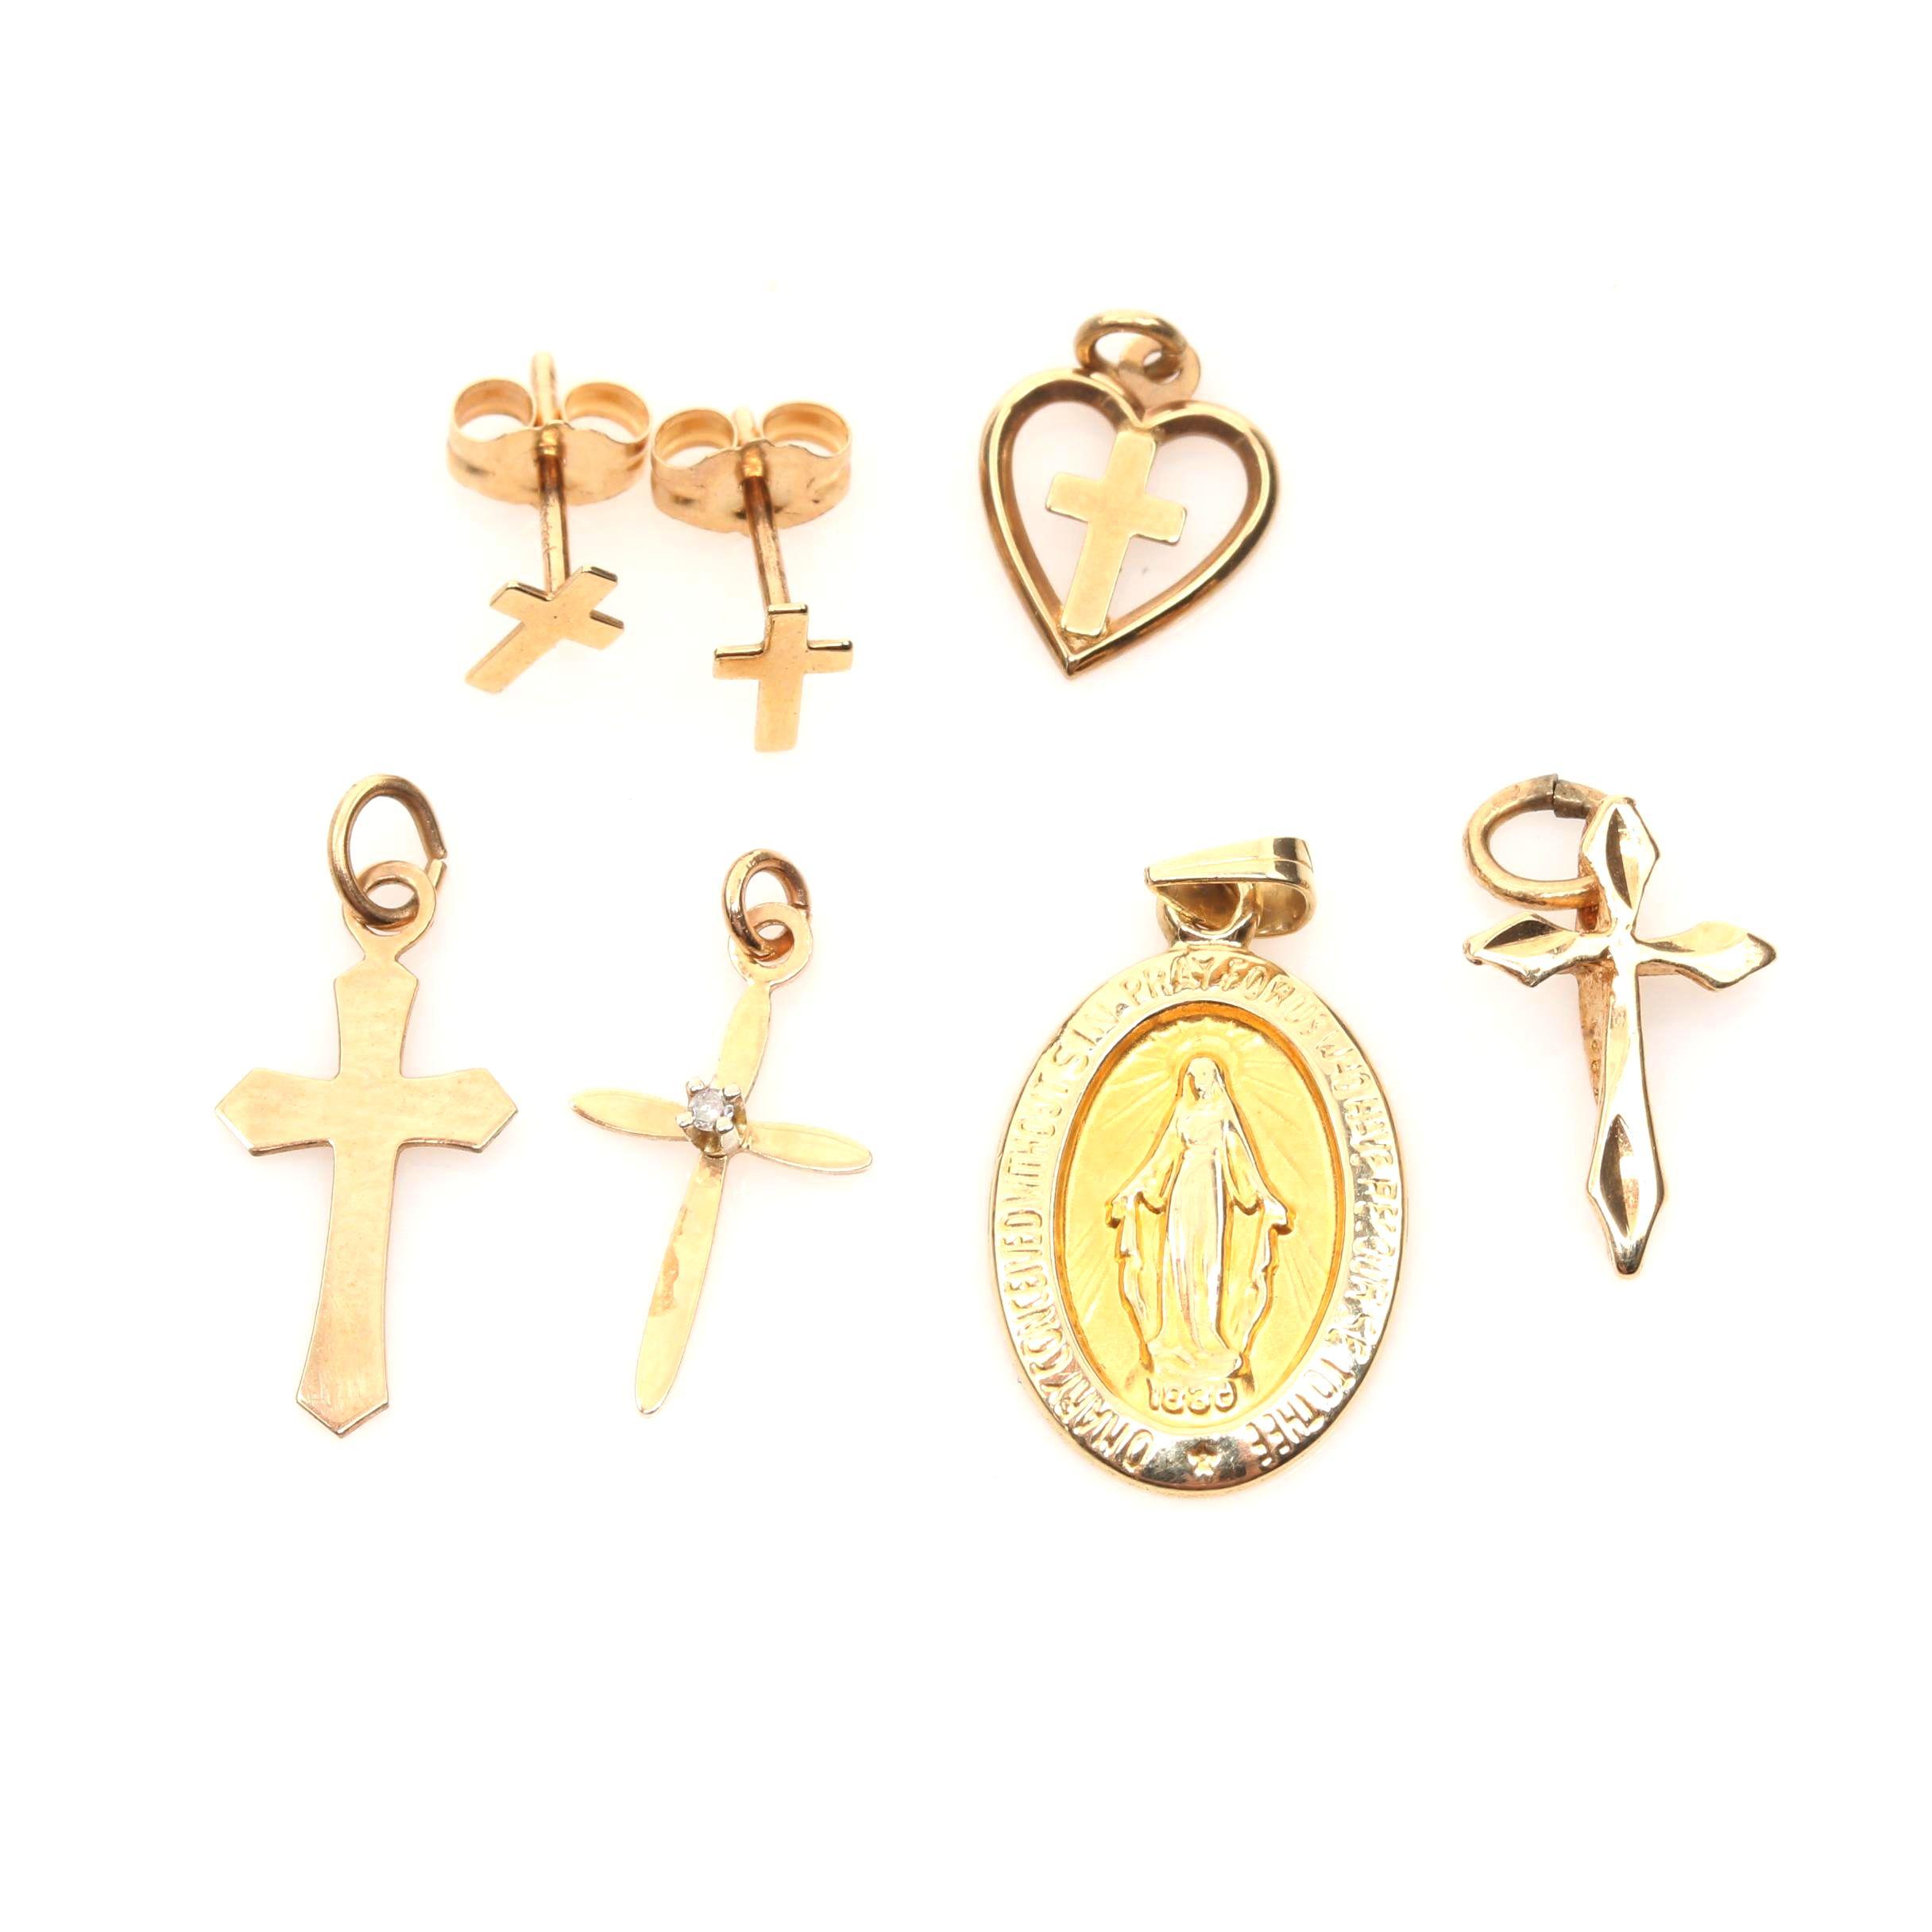 14K Yellow Gold Religious Jewelry Assortment EBTH